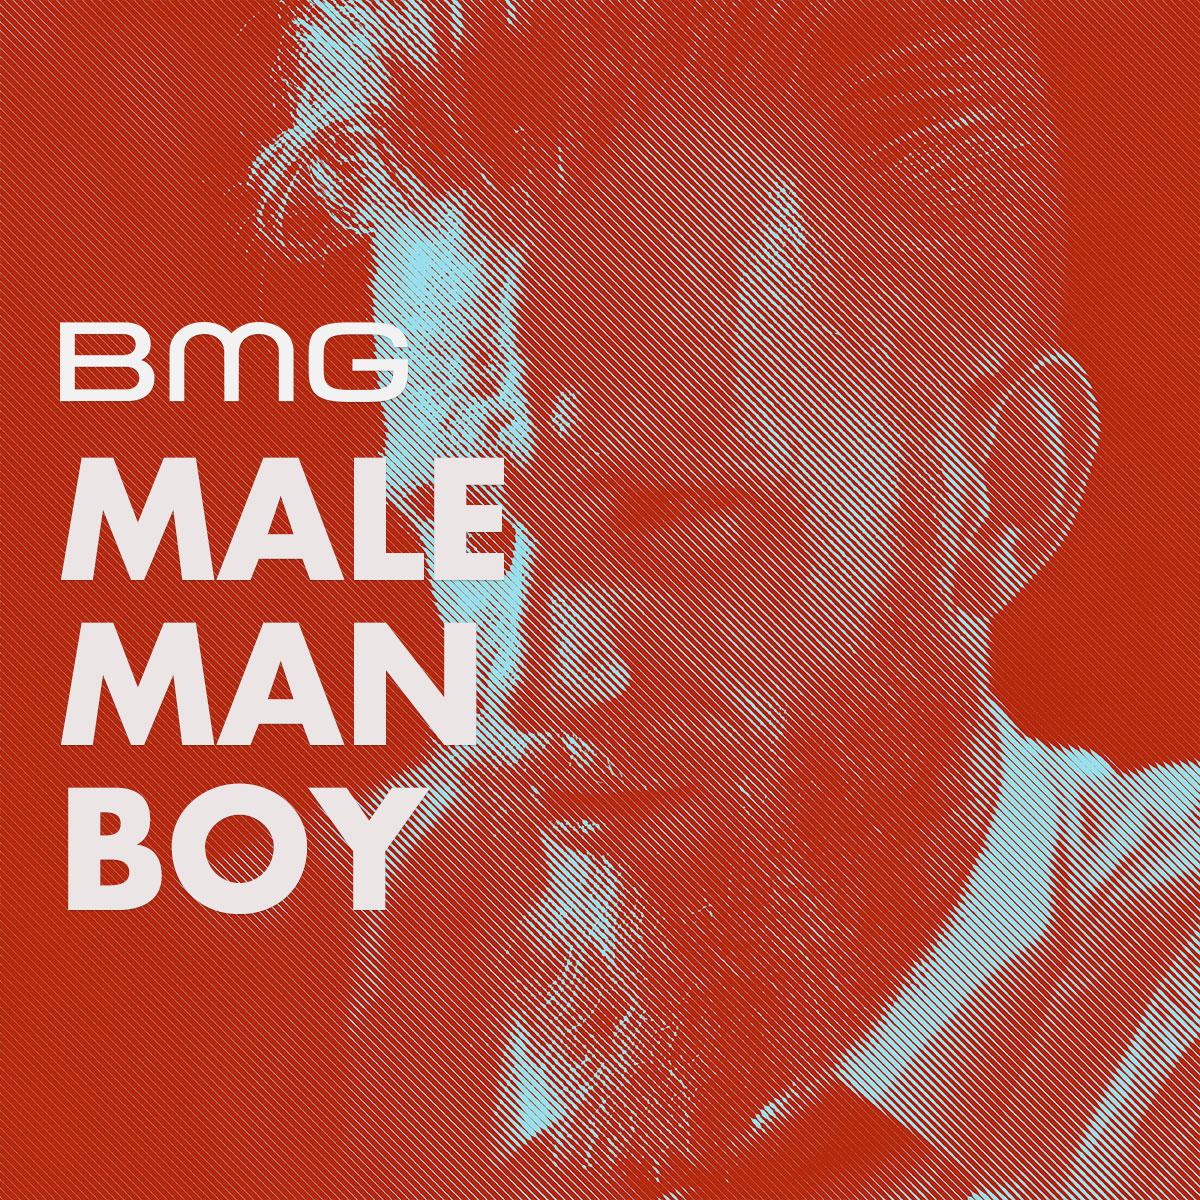 1200-x-1200-Male-Man-Boy.jpg